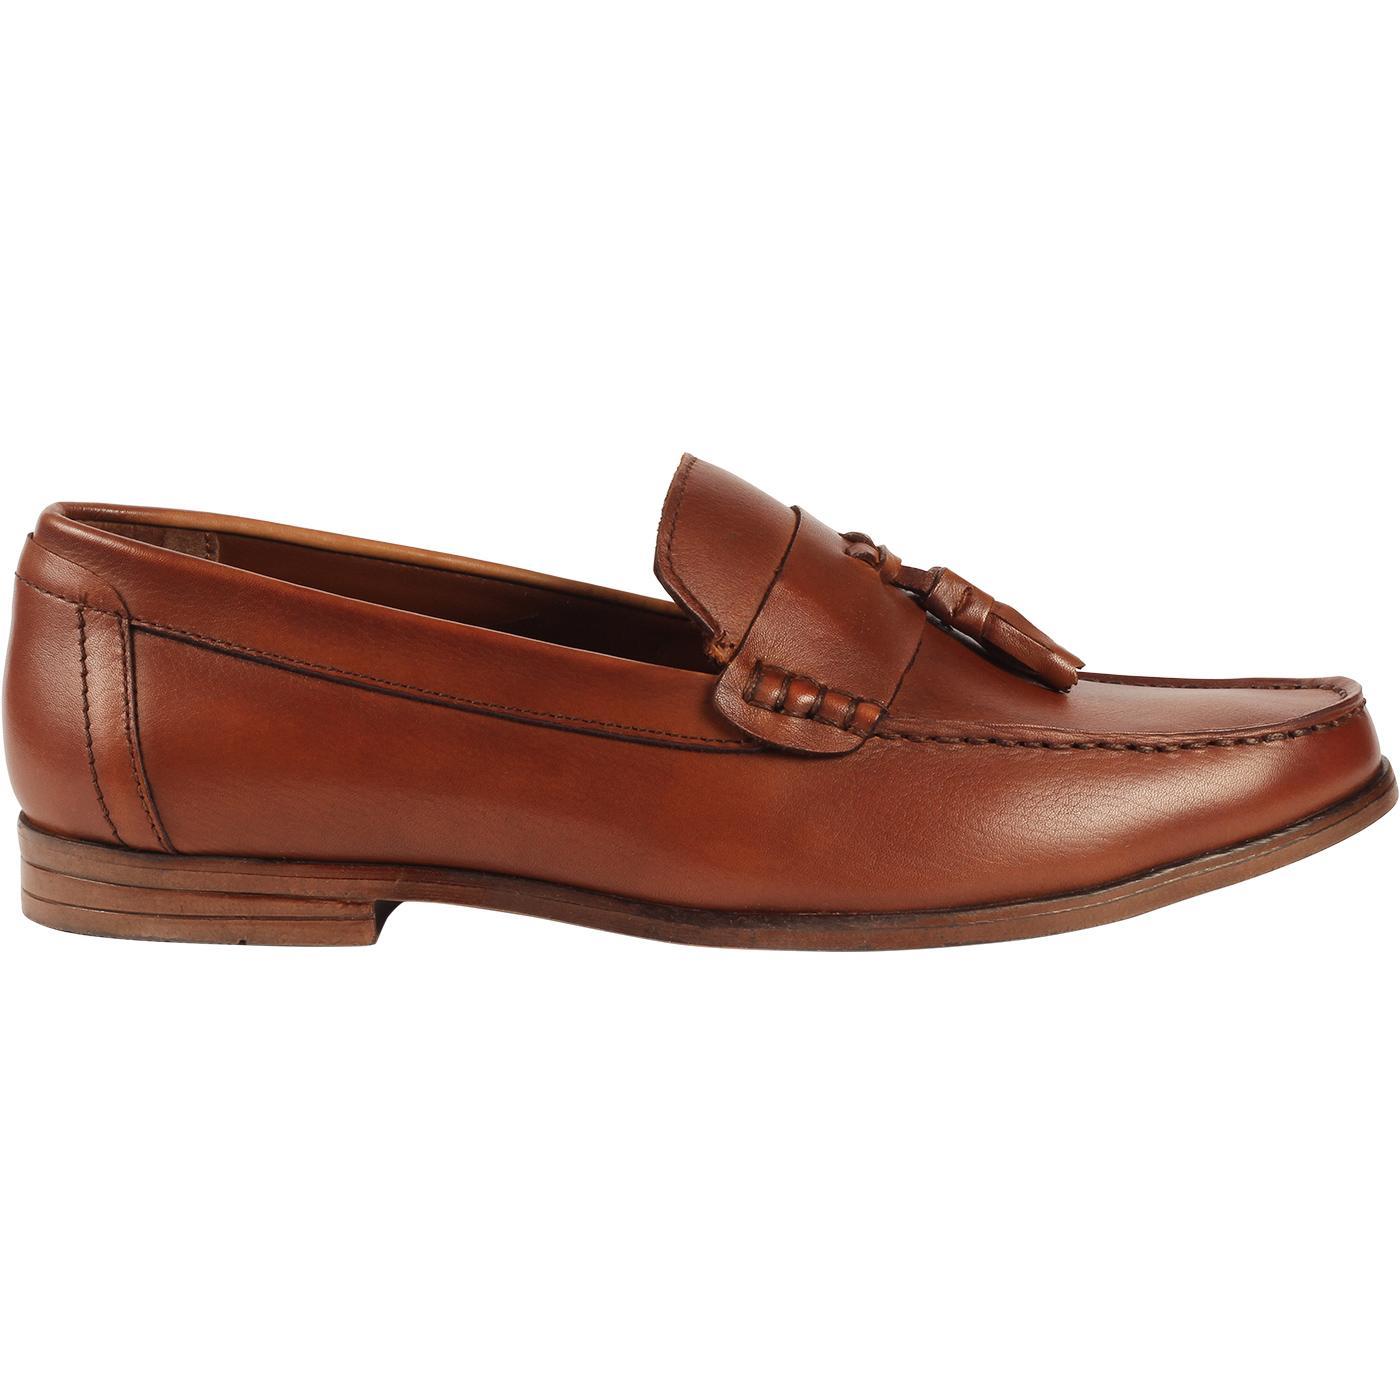 LAMBRETTA Men's Retro Mod Tassel Loafers (Tan)